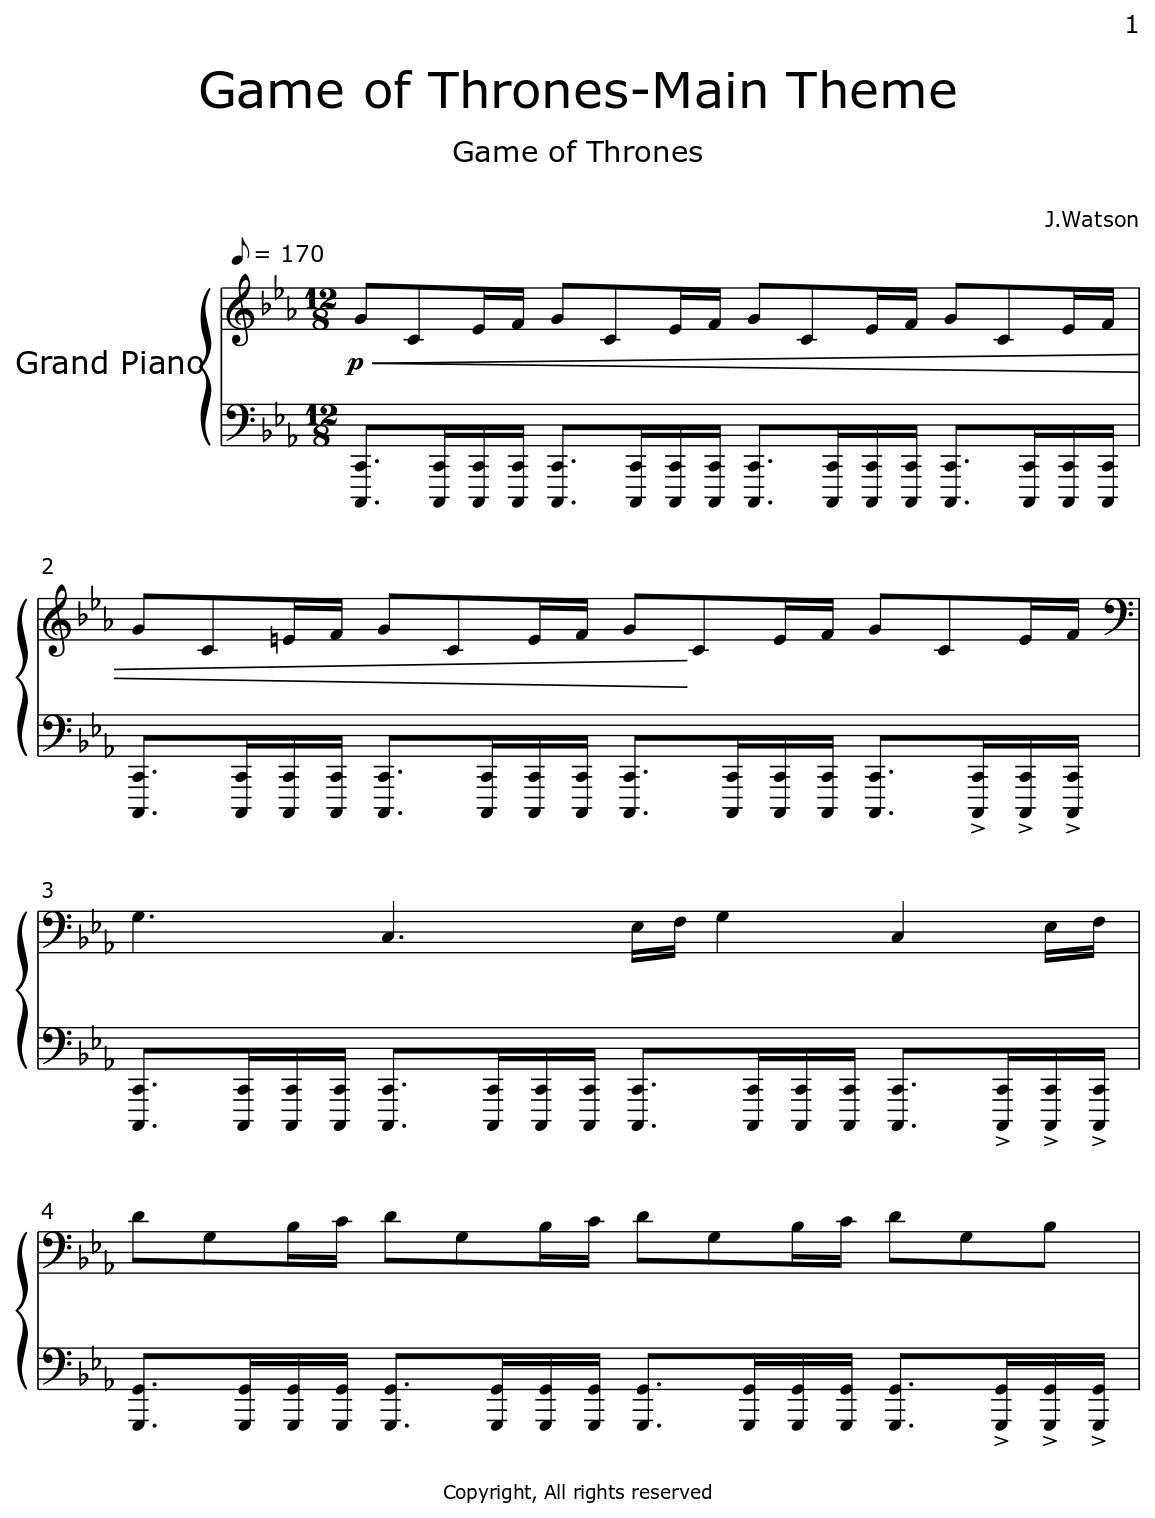 Game Of Thrones Titelmusik Klaviernoten game of thrones-main theme - flat